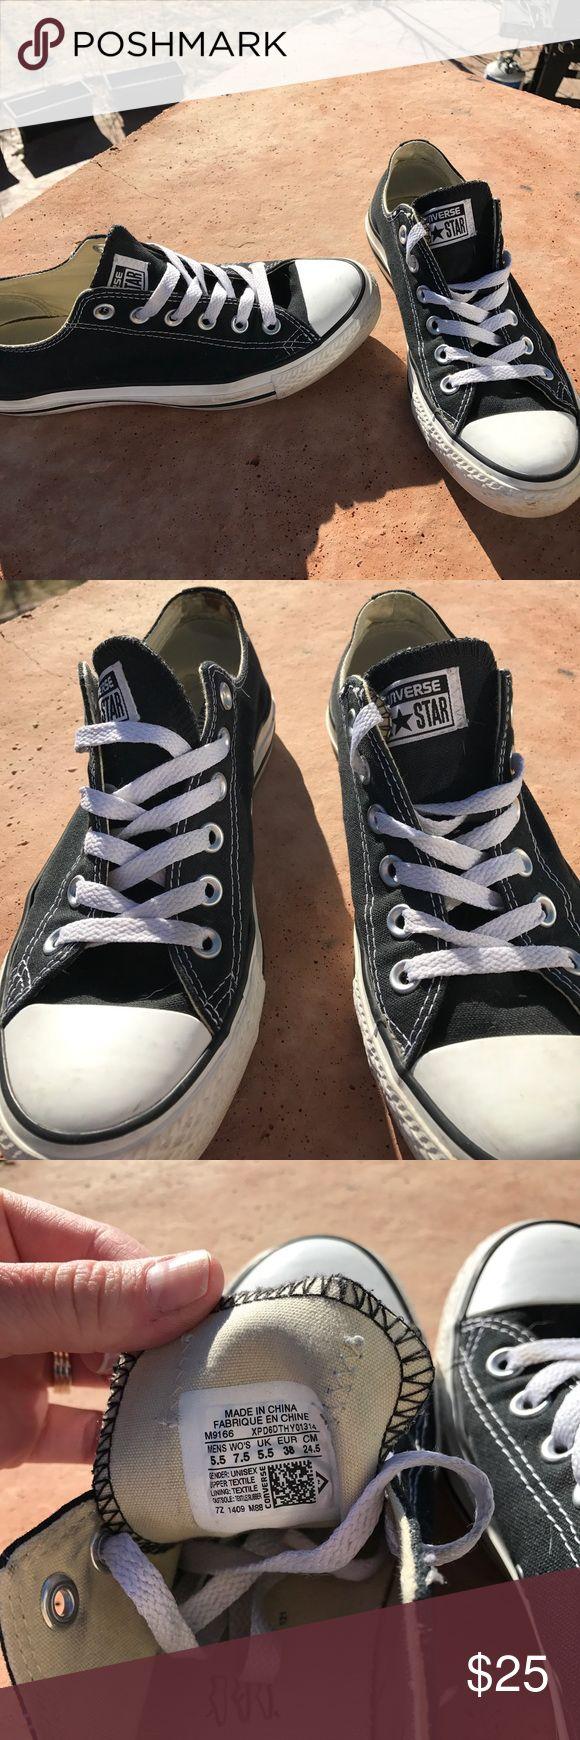 All star converse chucks Converse black chucks men's 5.5 women's 7.5 worn Converse Shoes